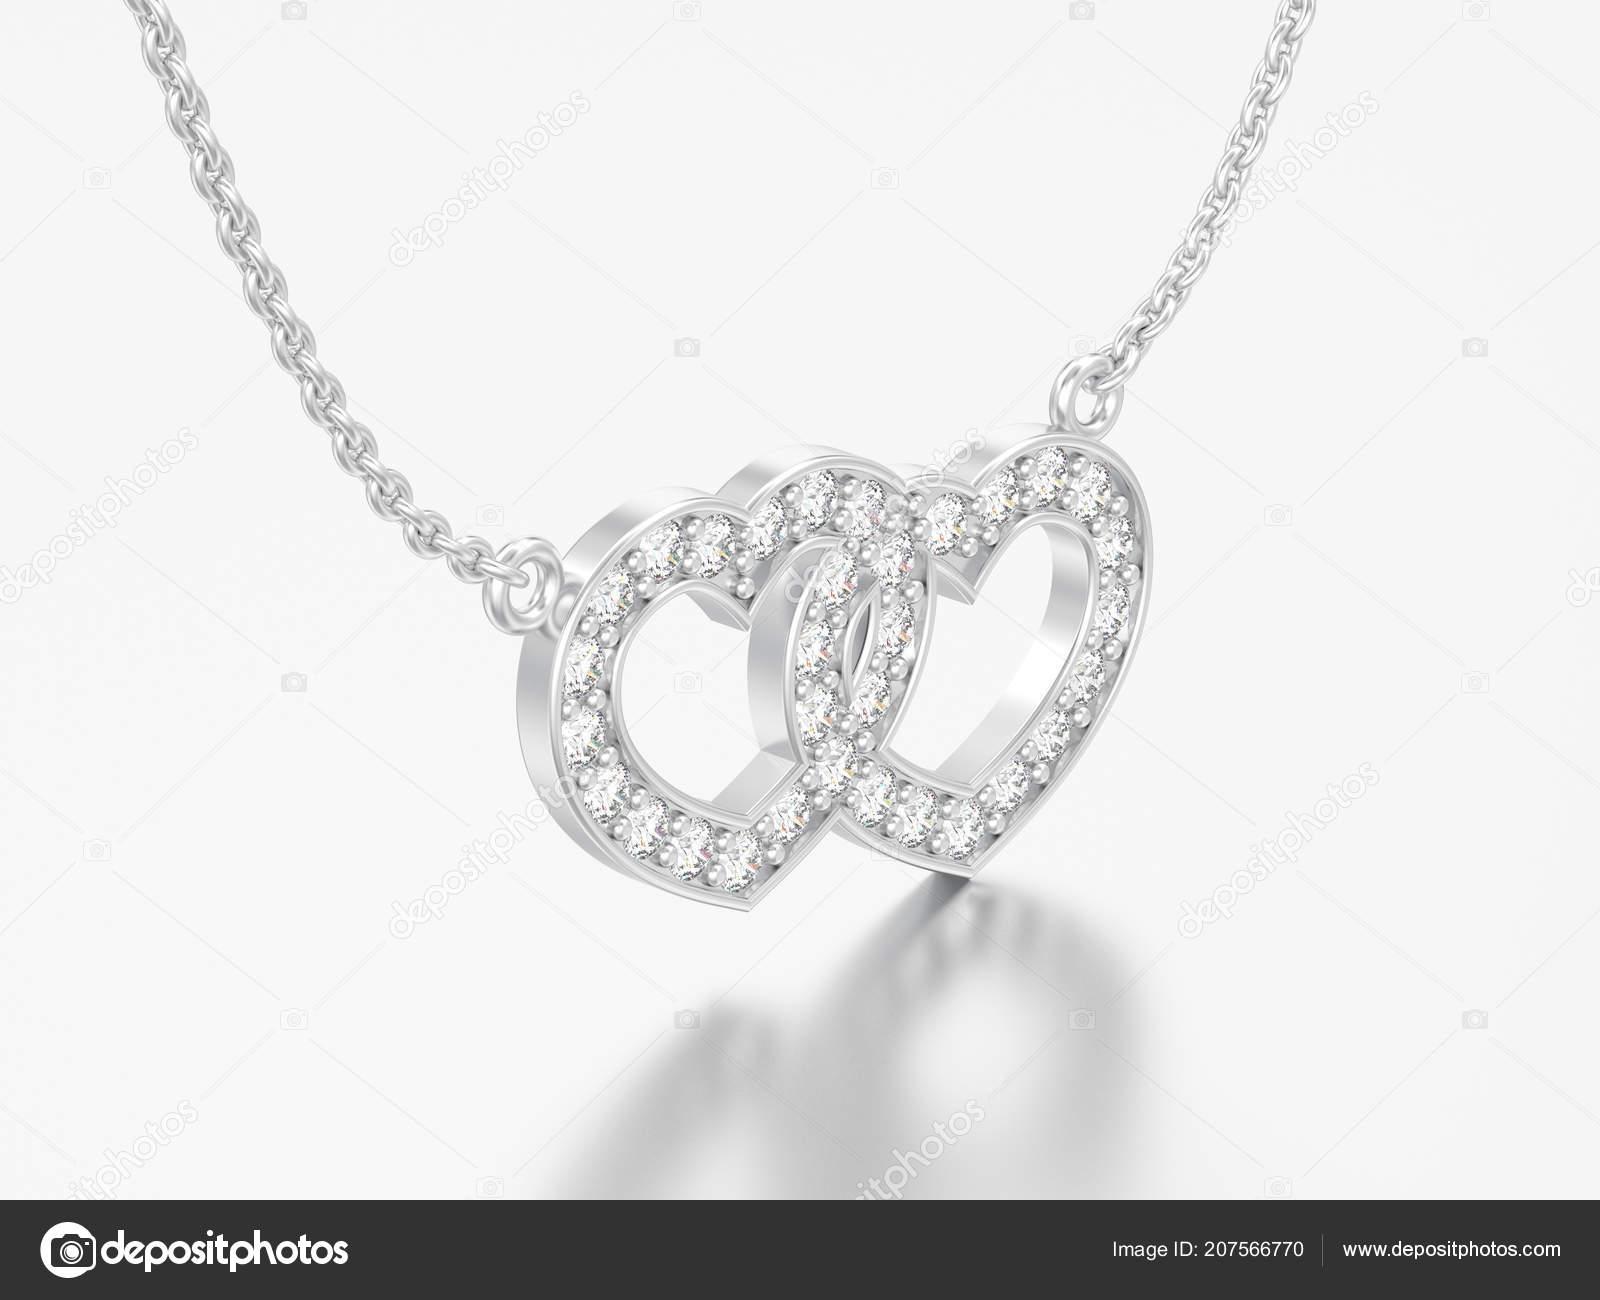 29039a3439 3D απεικόνιση κοσμήματα δύο καρδιές λευκό χρυσό ή ασήμι διαμαντένιο κολιέ  αλυσίδα σε γκρίζο φόντο– εικόνα αρχείου